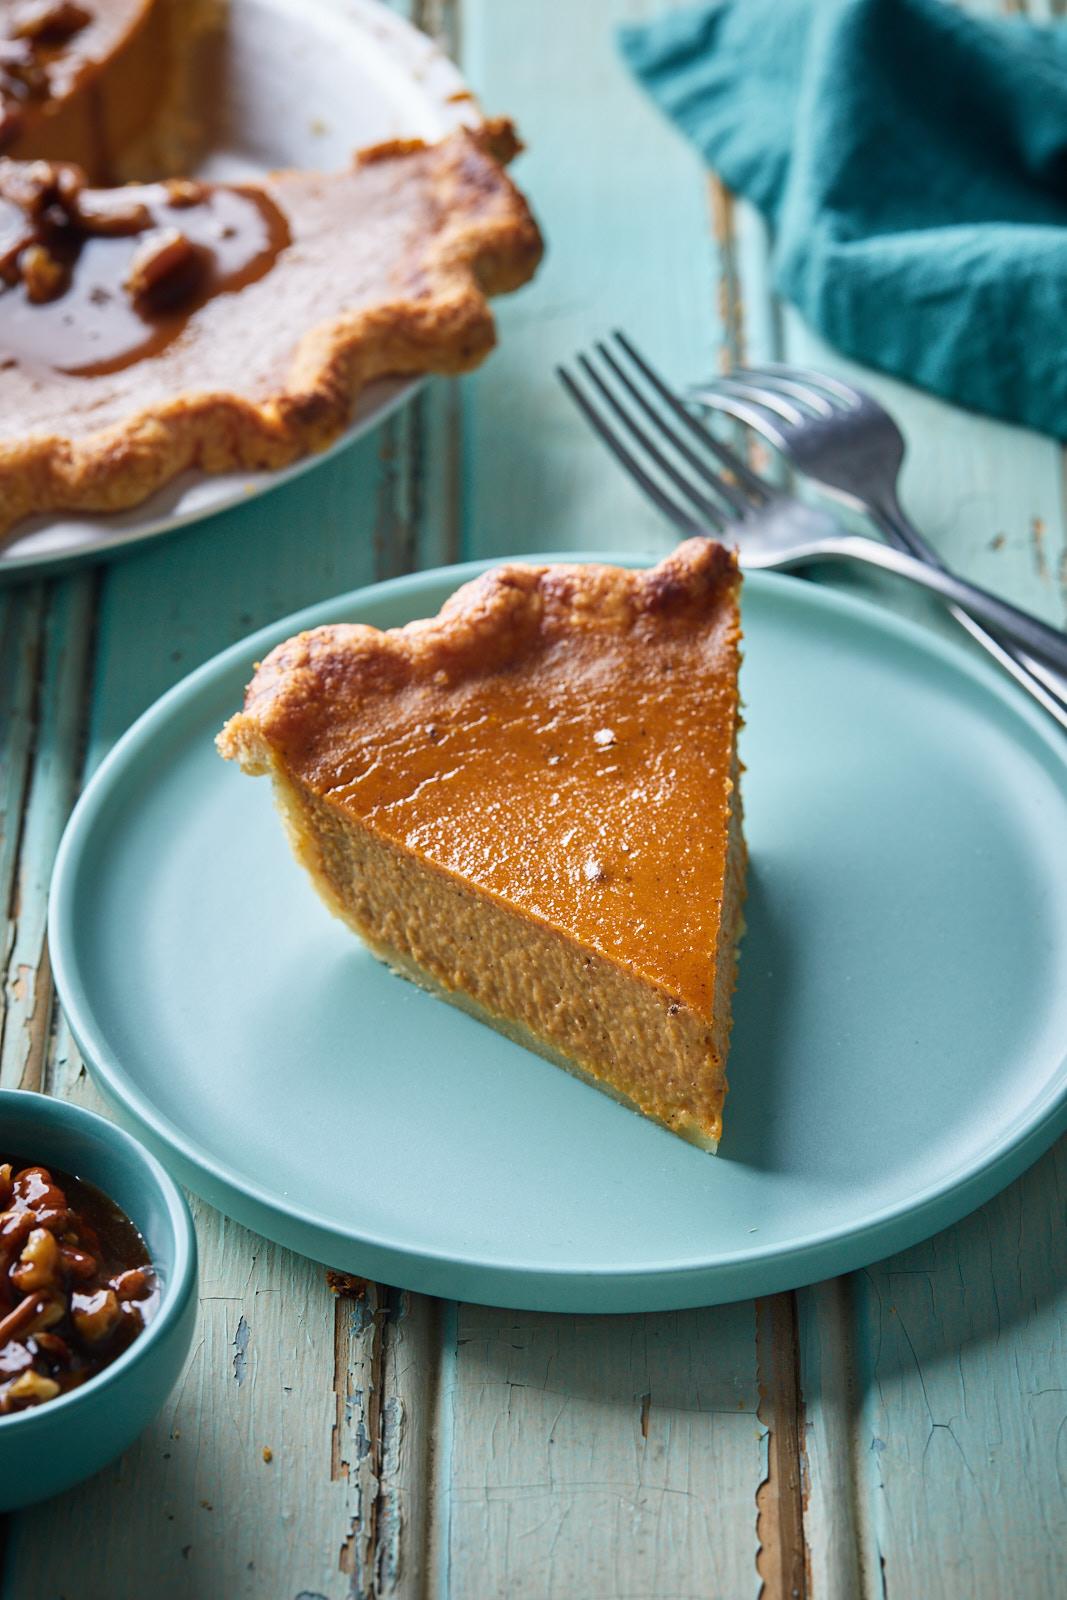 Classic Pumpkin Pie With No Shrink Pie Crust